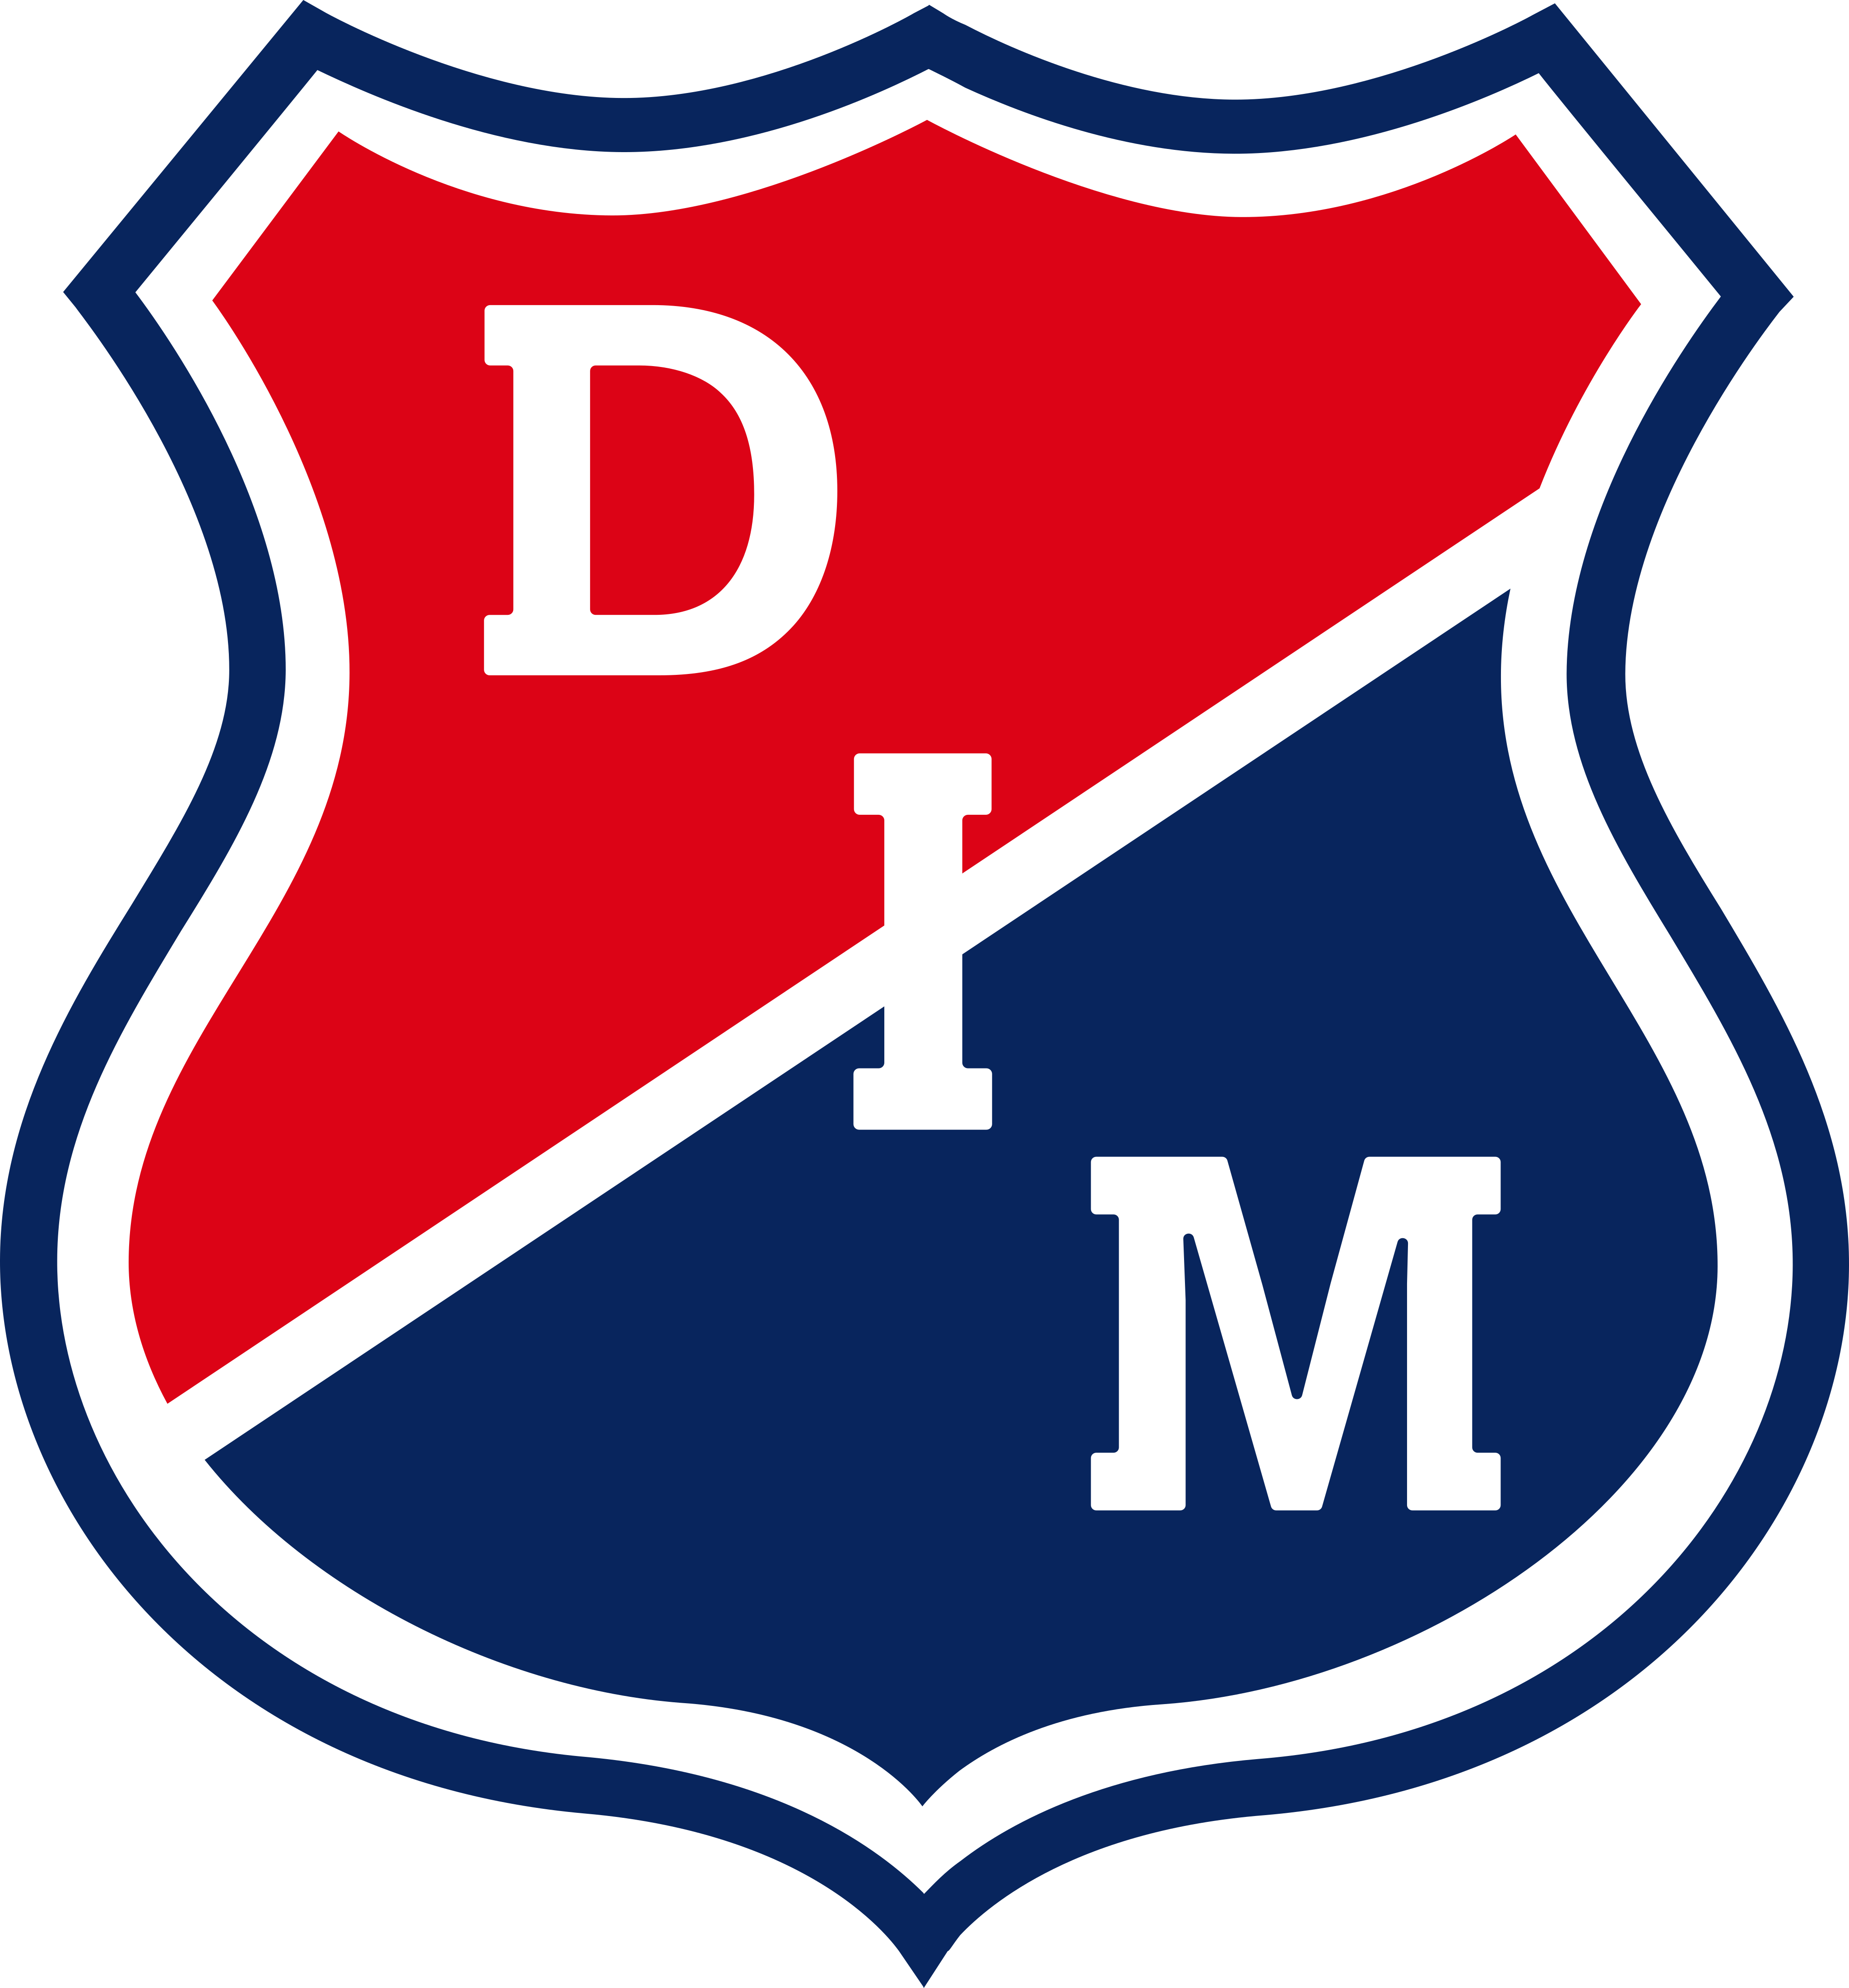 independiente medellin logo - Independiente Medellín Logo